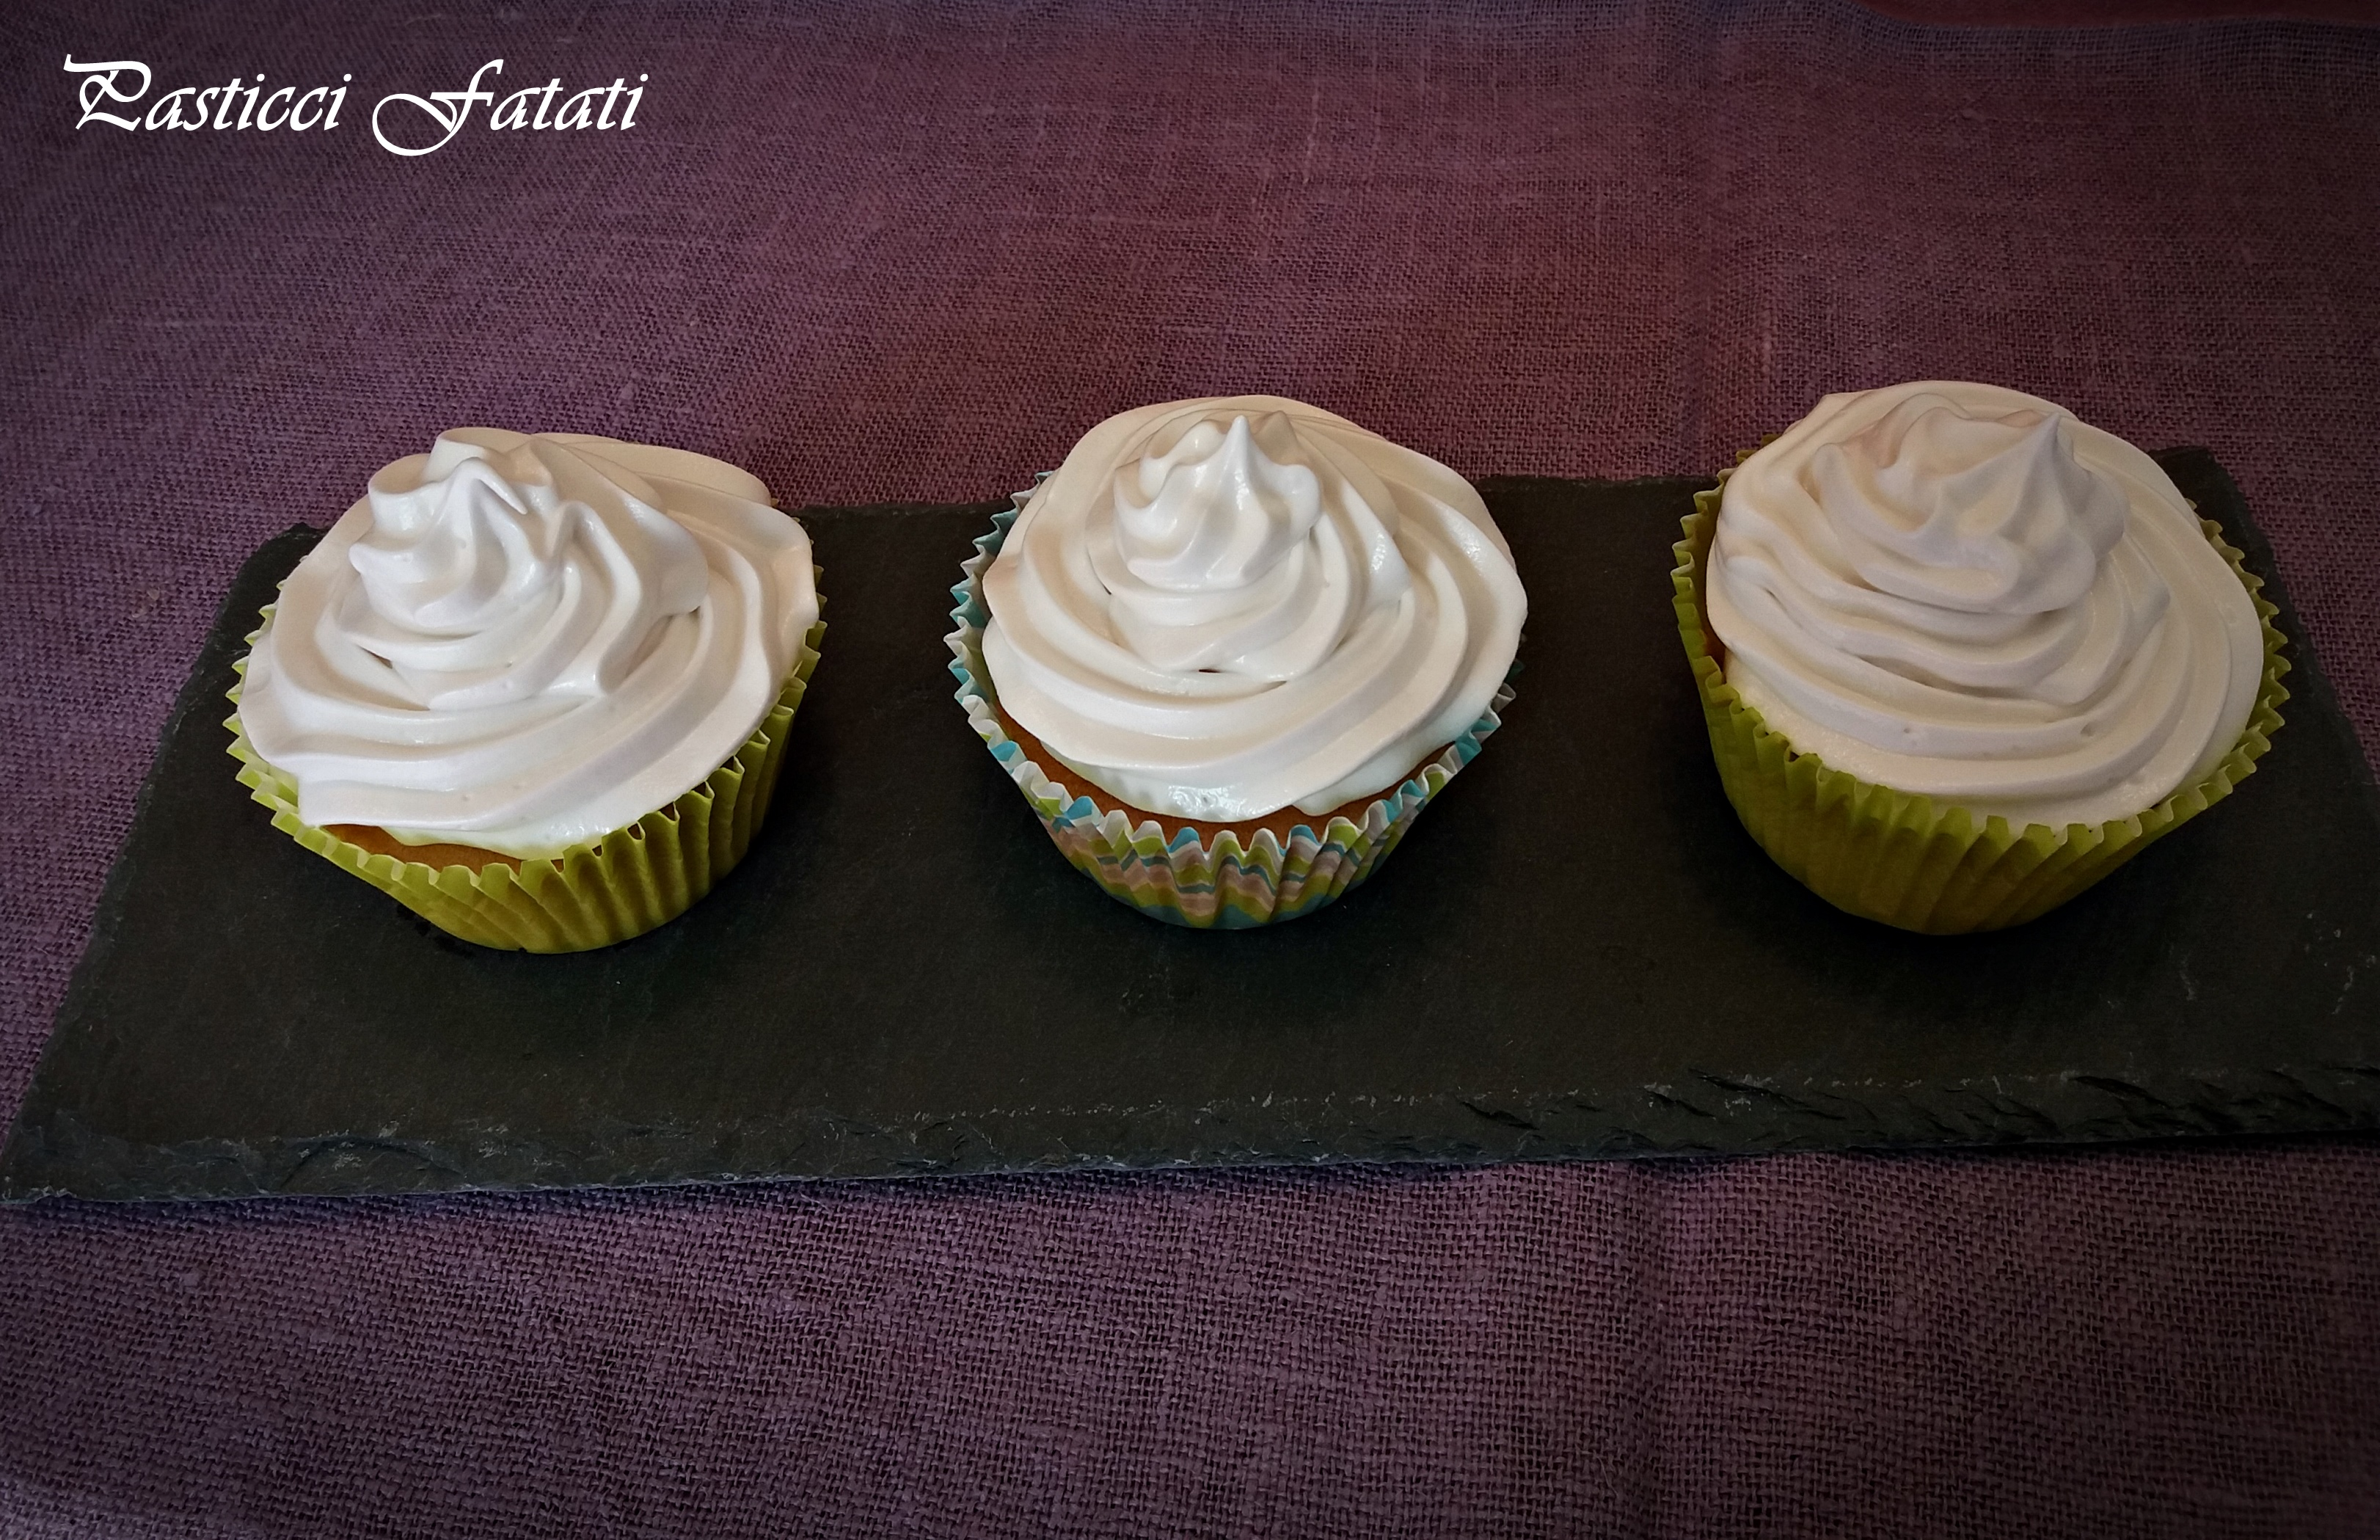 Cupcakes-Baileys-chocolate-pf-dettaglio Cupcakes Baileys Chocolate